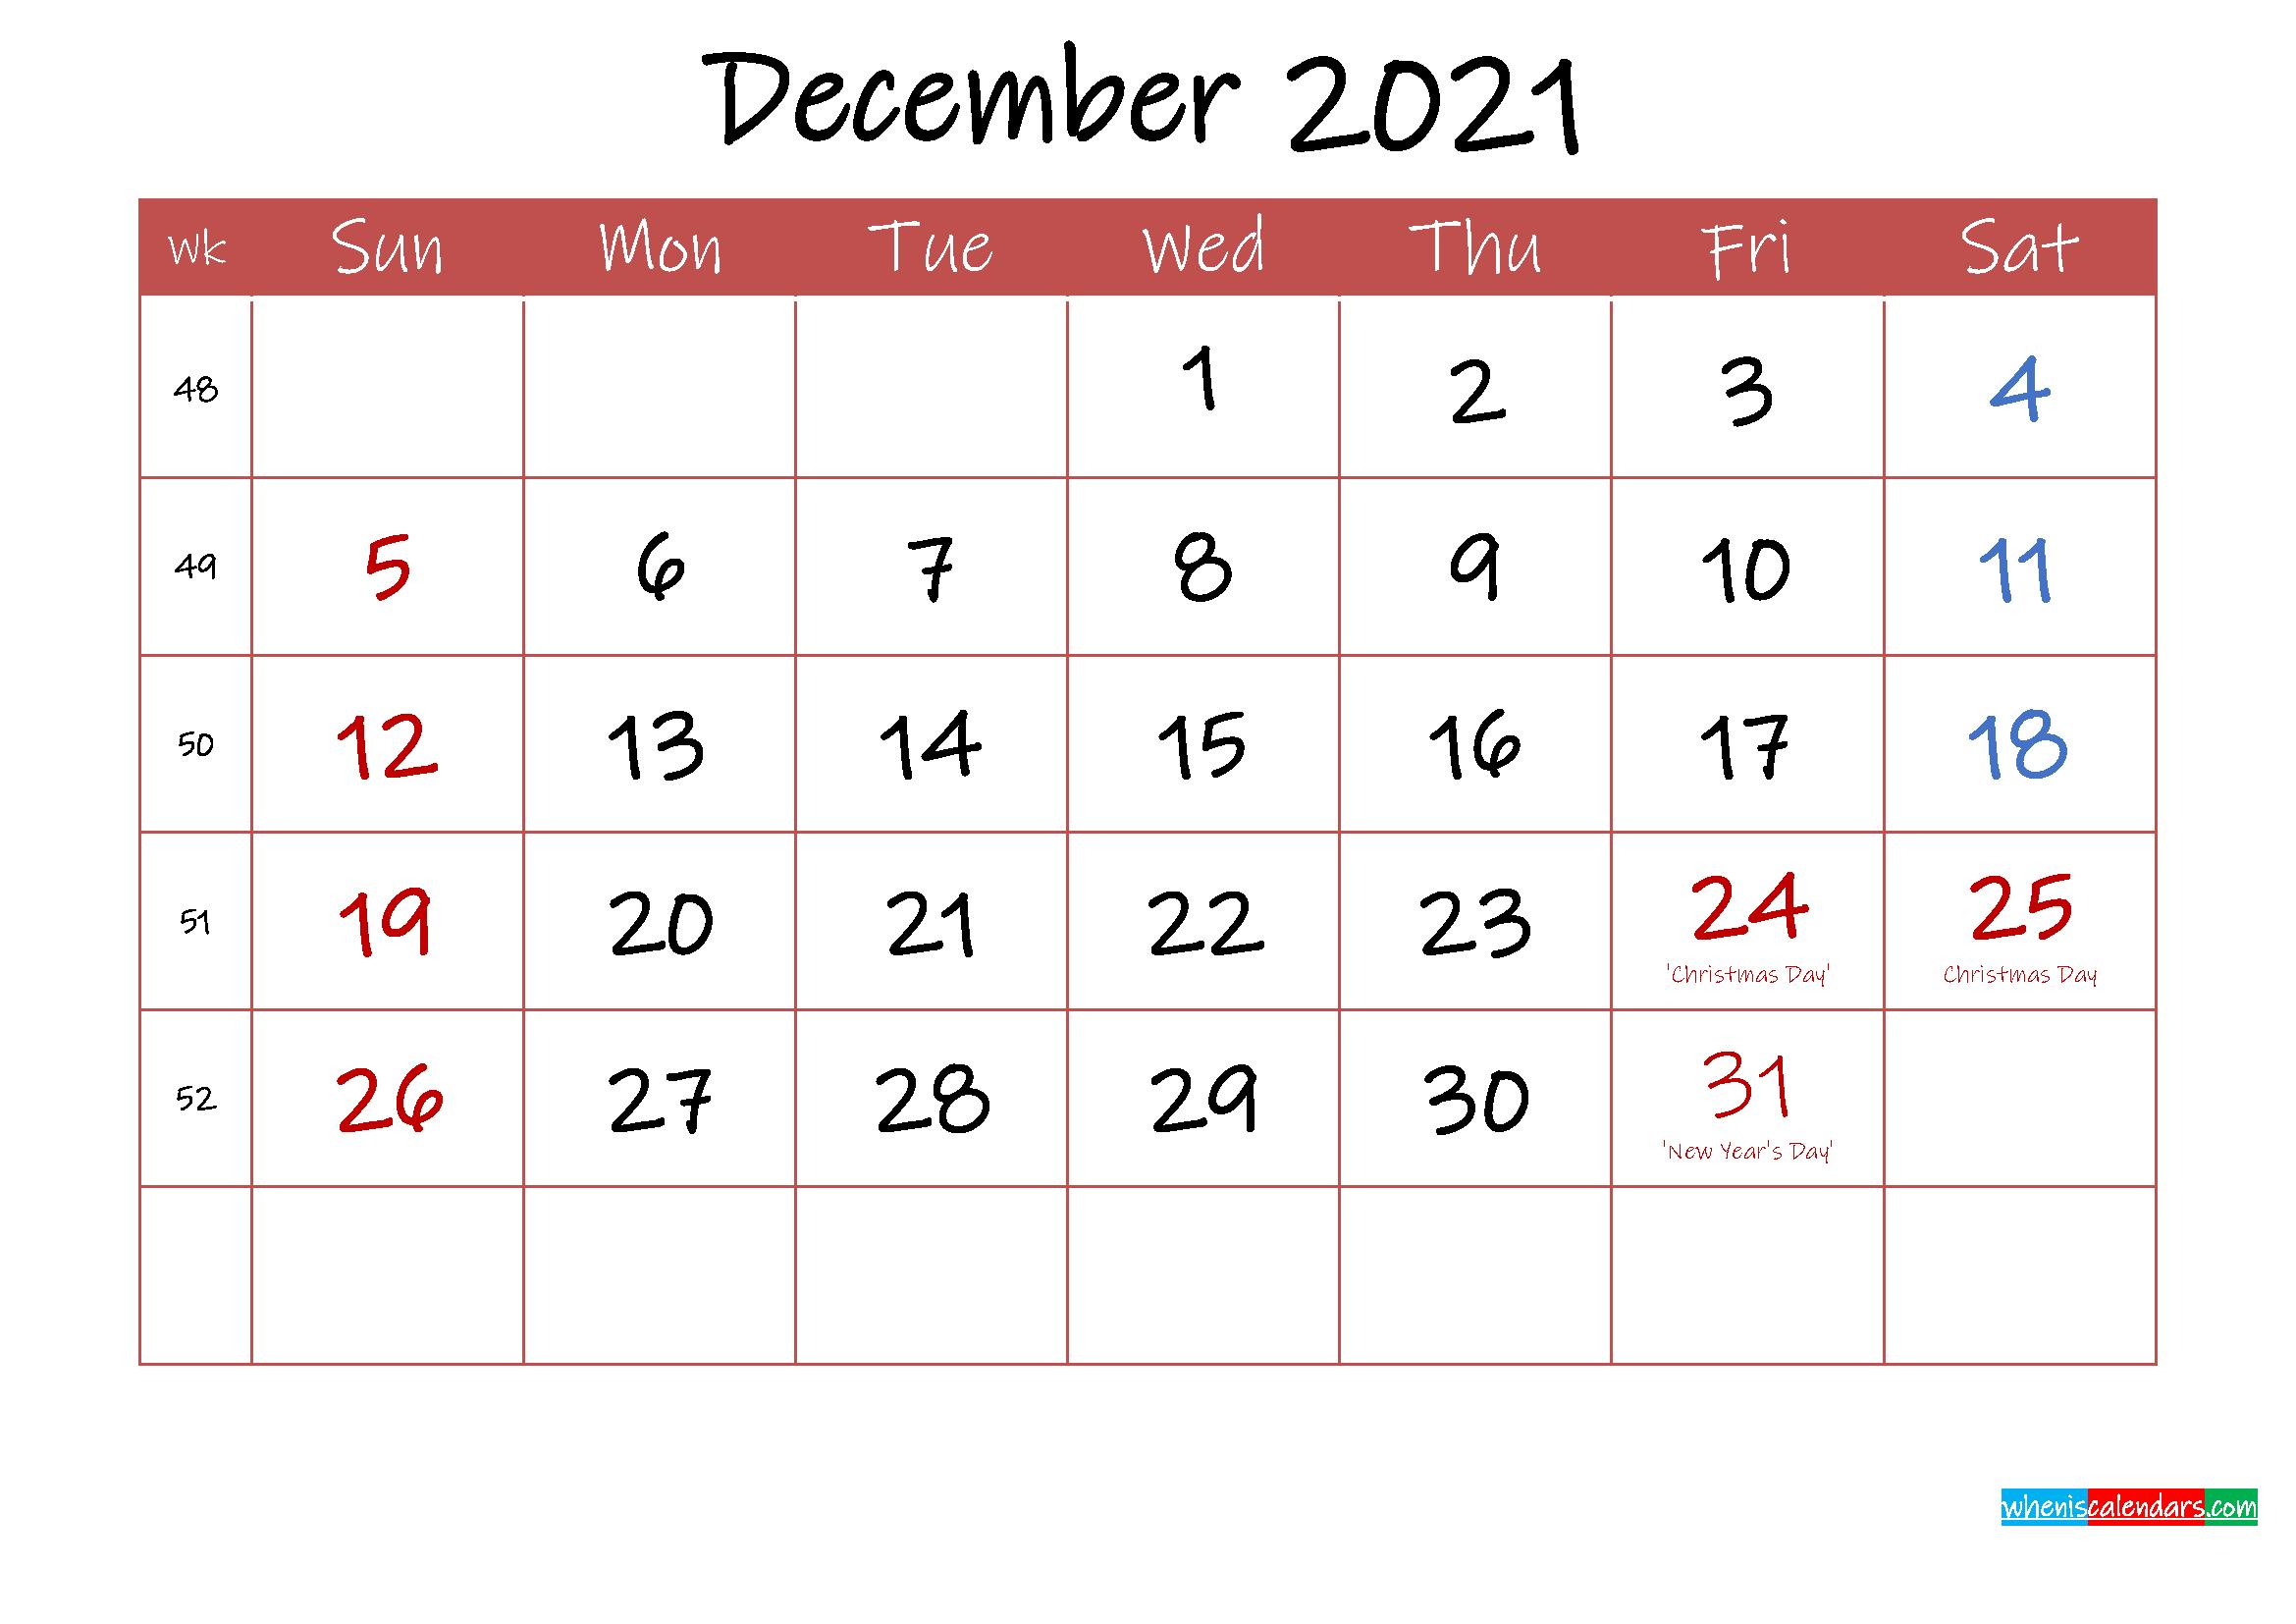 Printable December 2021 Calendar with Holidays